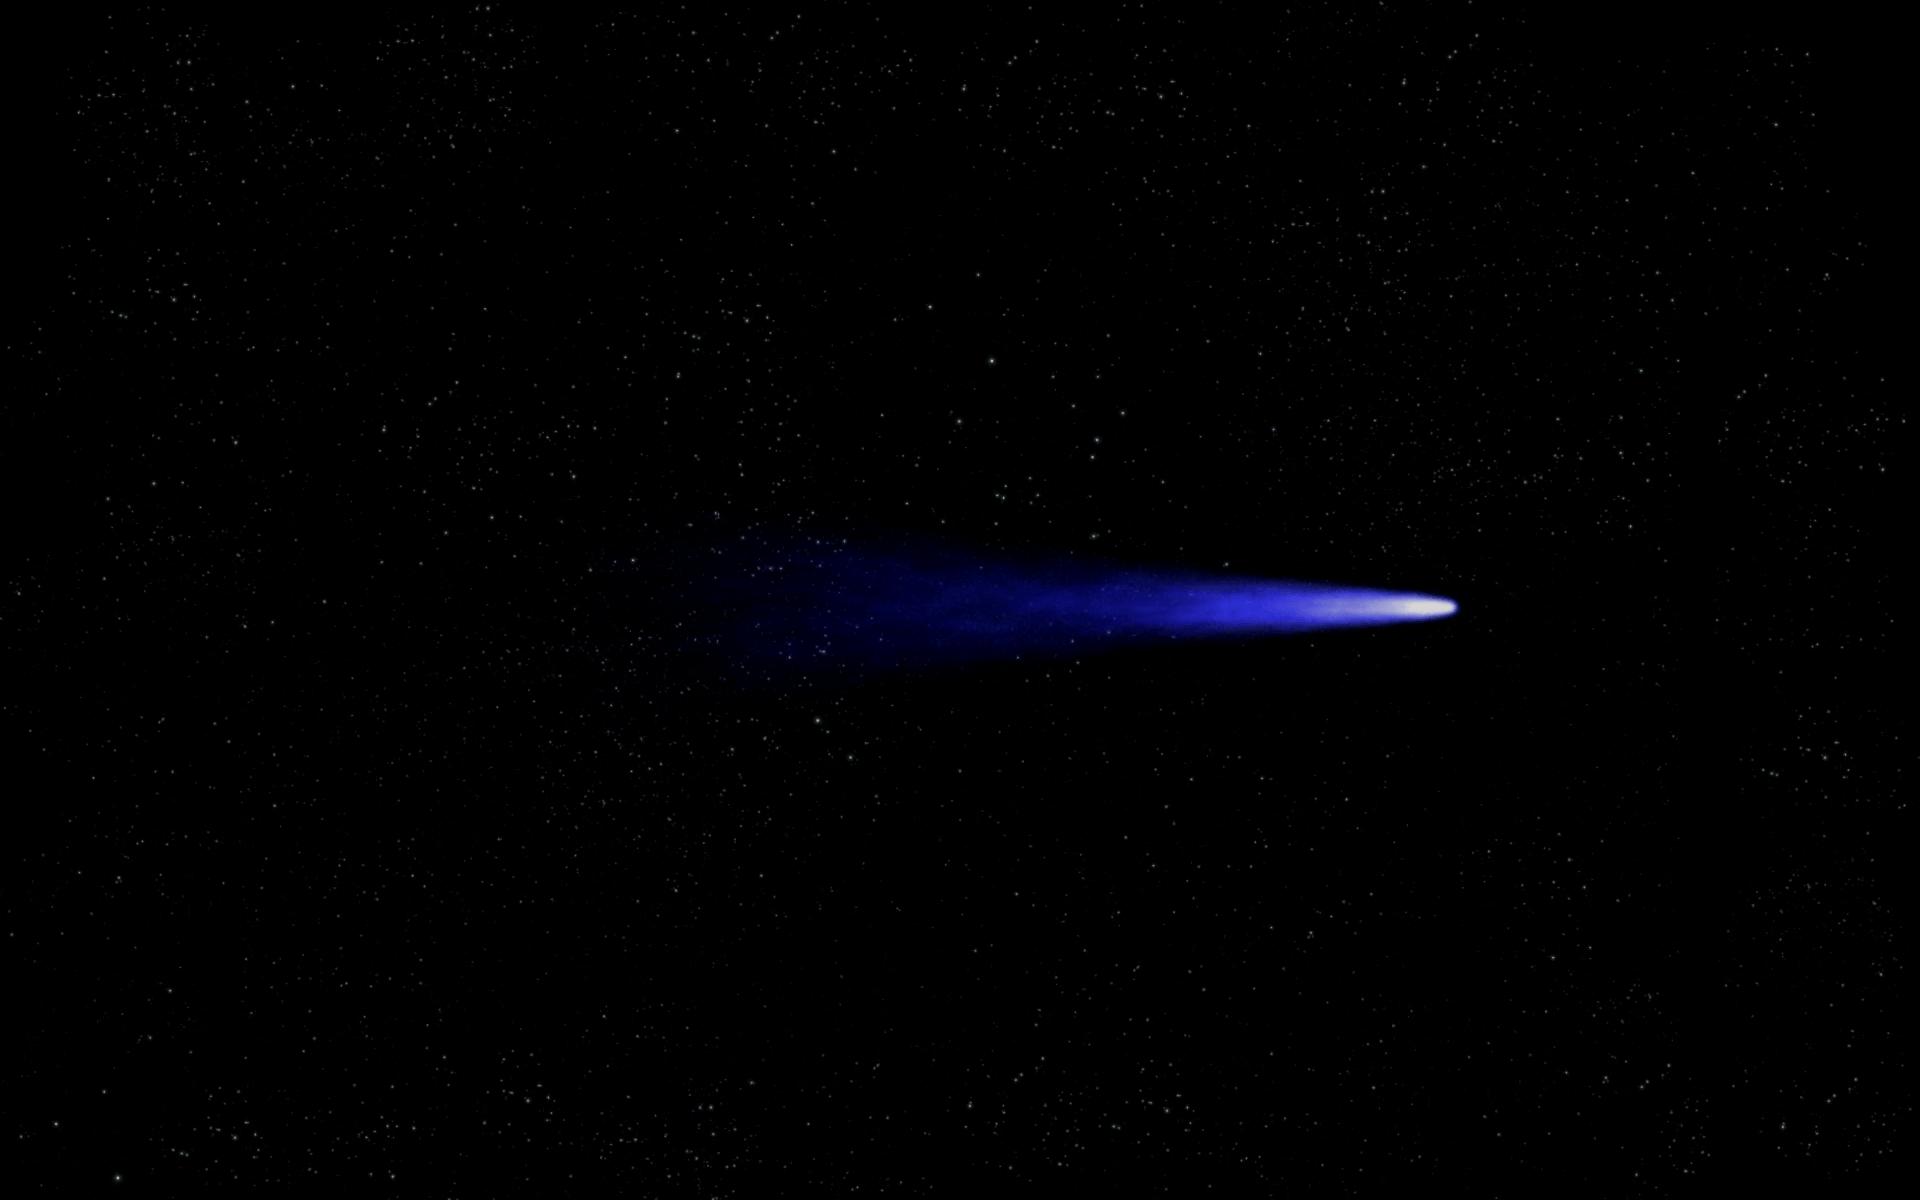 Комета в картинках